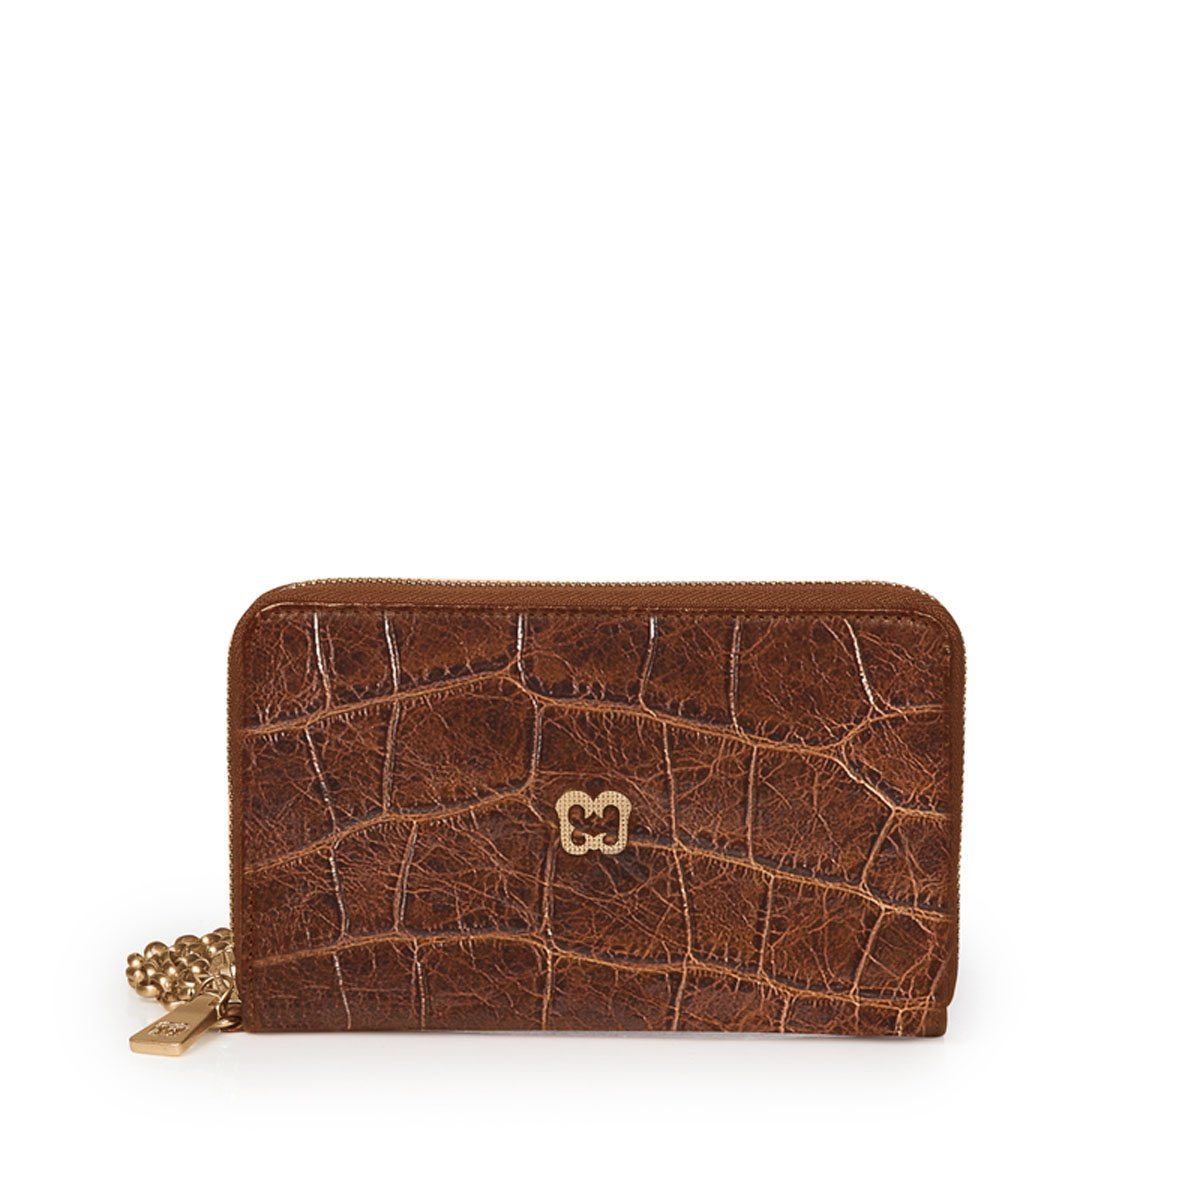 Eric Javits Luxury Fashion Designer Women's Handbag - Smartphone Wristlet - Burnt